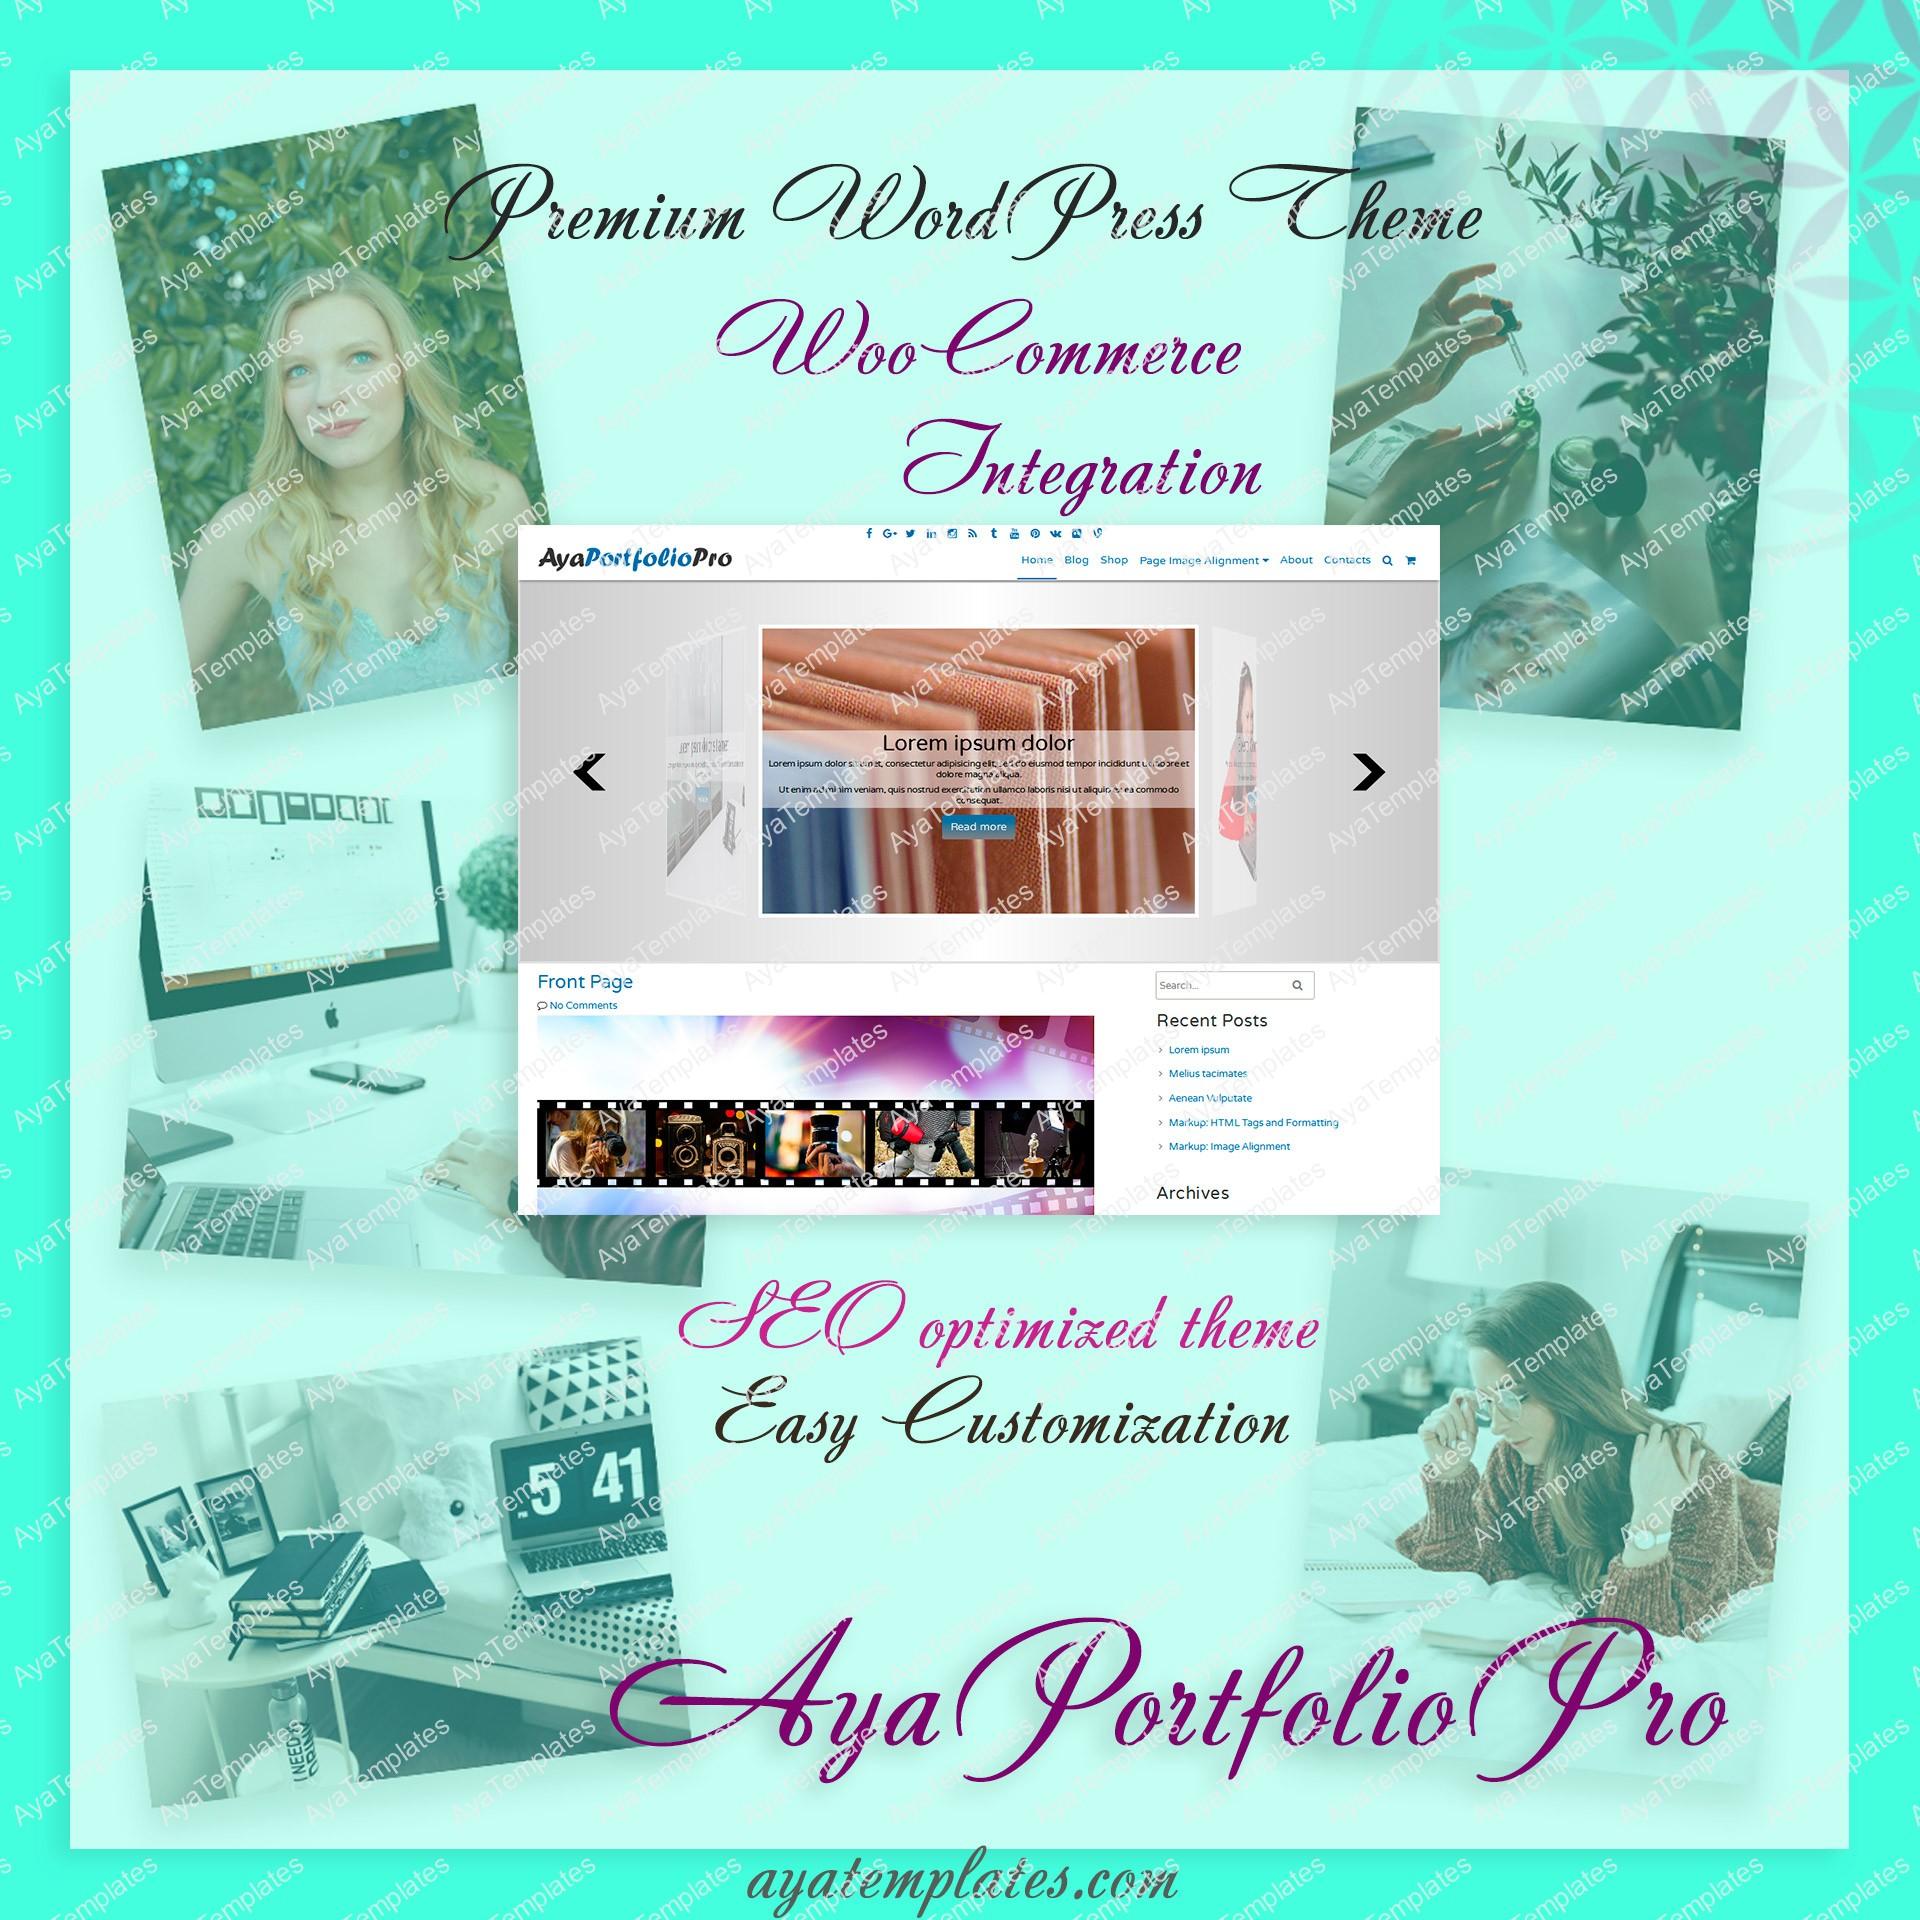 ayaportfoliopro-premium-wordpress-theme-mockup-ayatemplates-com